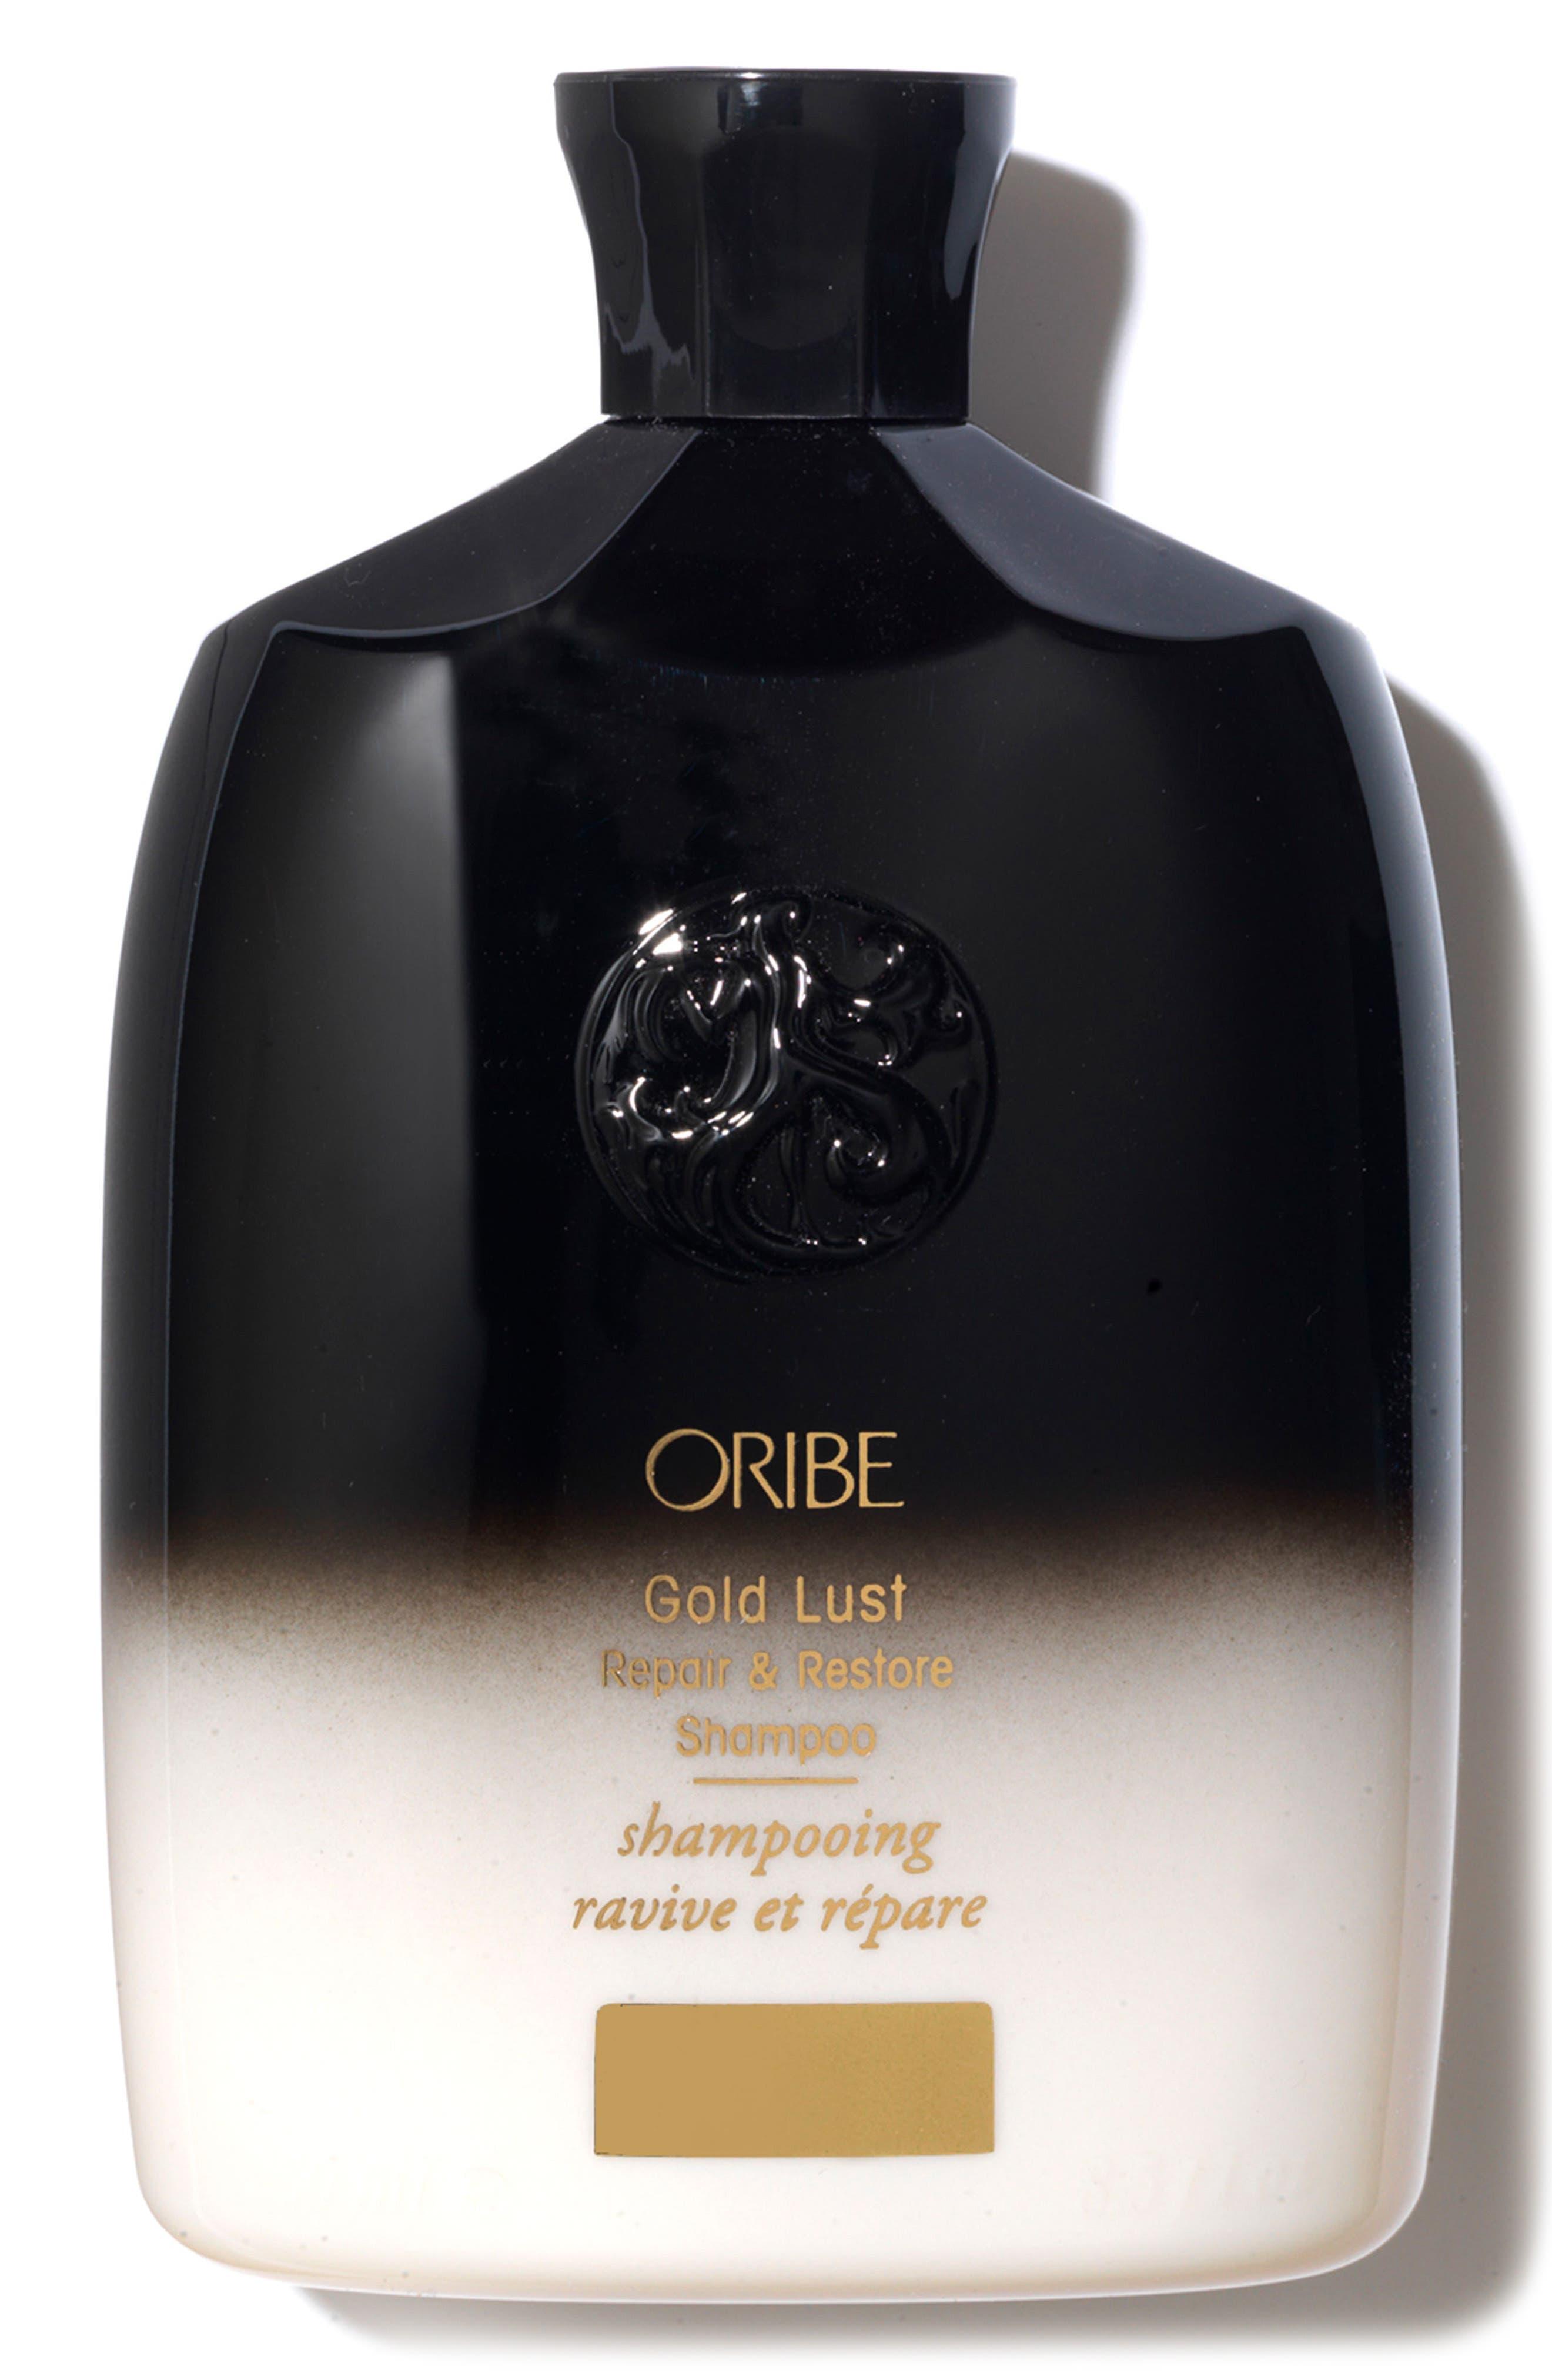 SPACE.NK.apothecary Oribe Gold Lust Repair & Restore Shampoo,                             Main thumbnail 1, color,                             NO COLOR